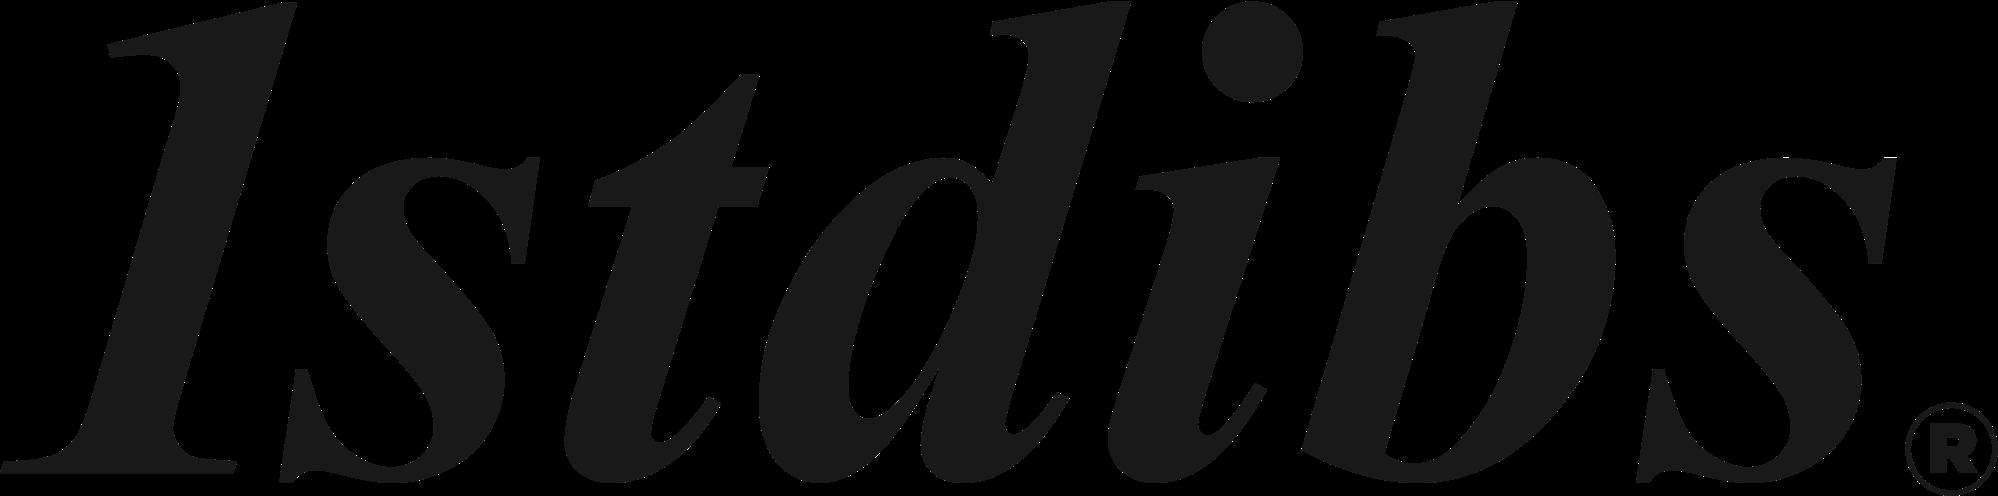 1stdibs-logo-black.png